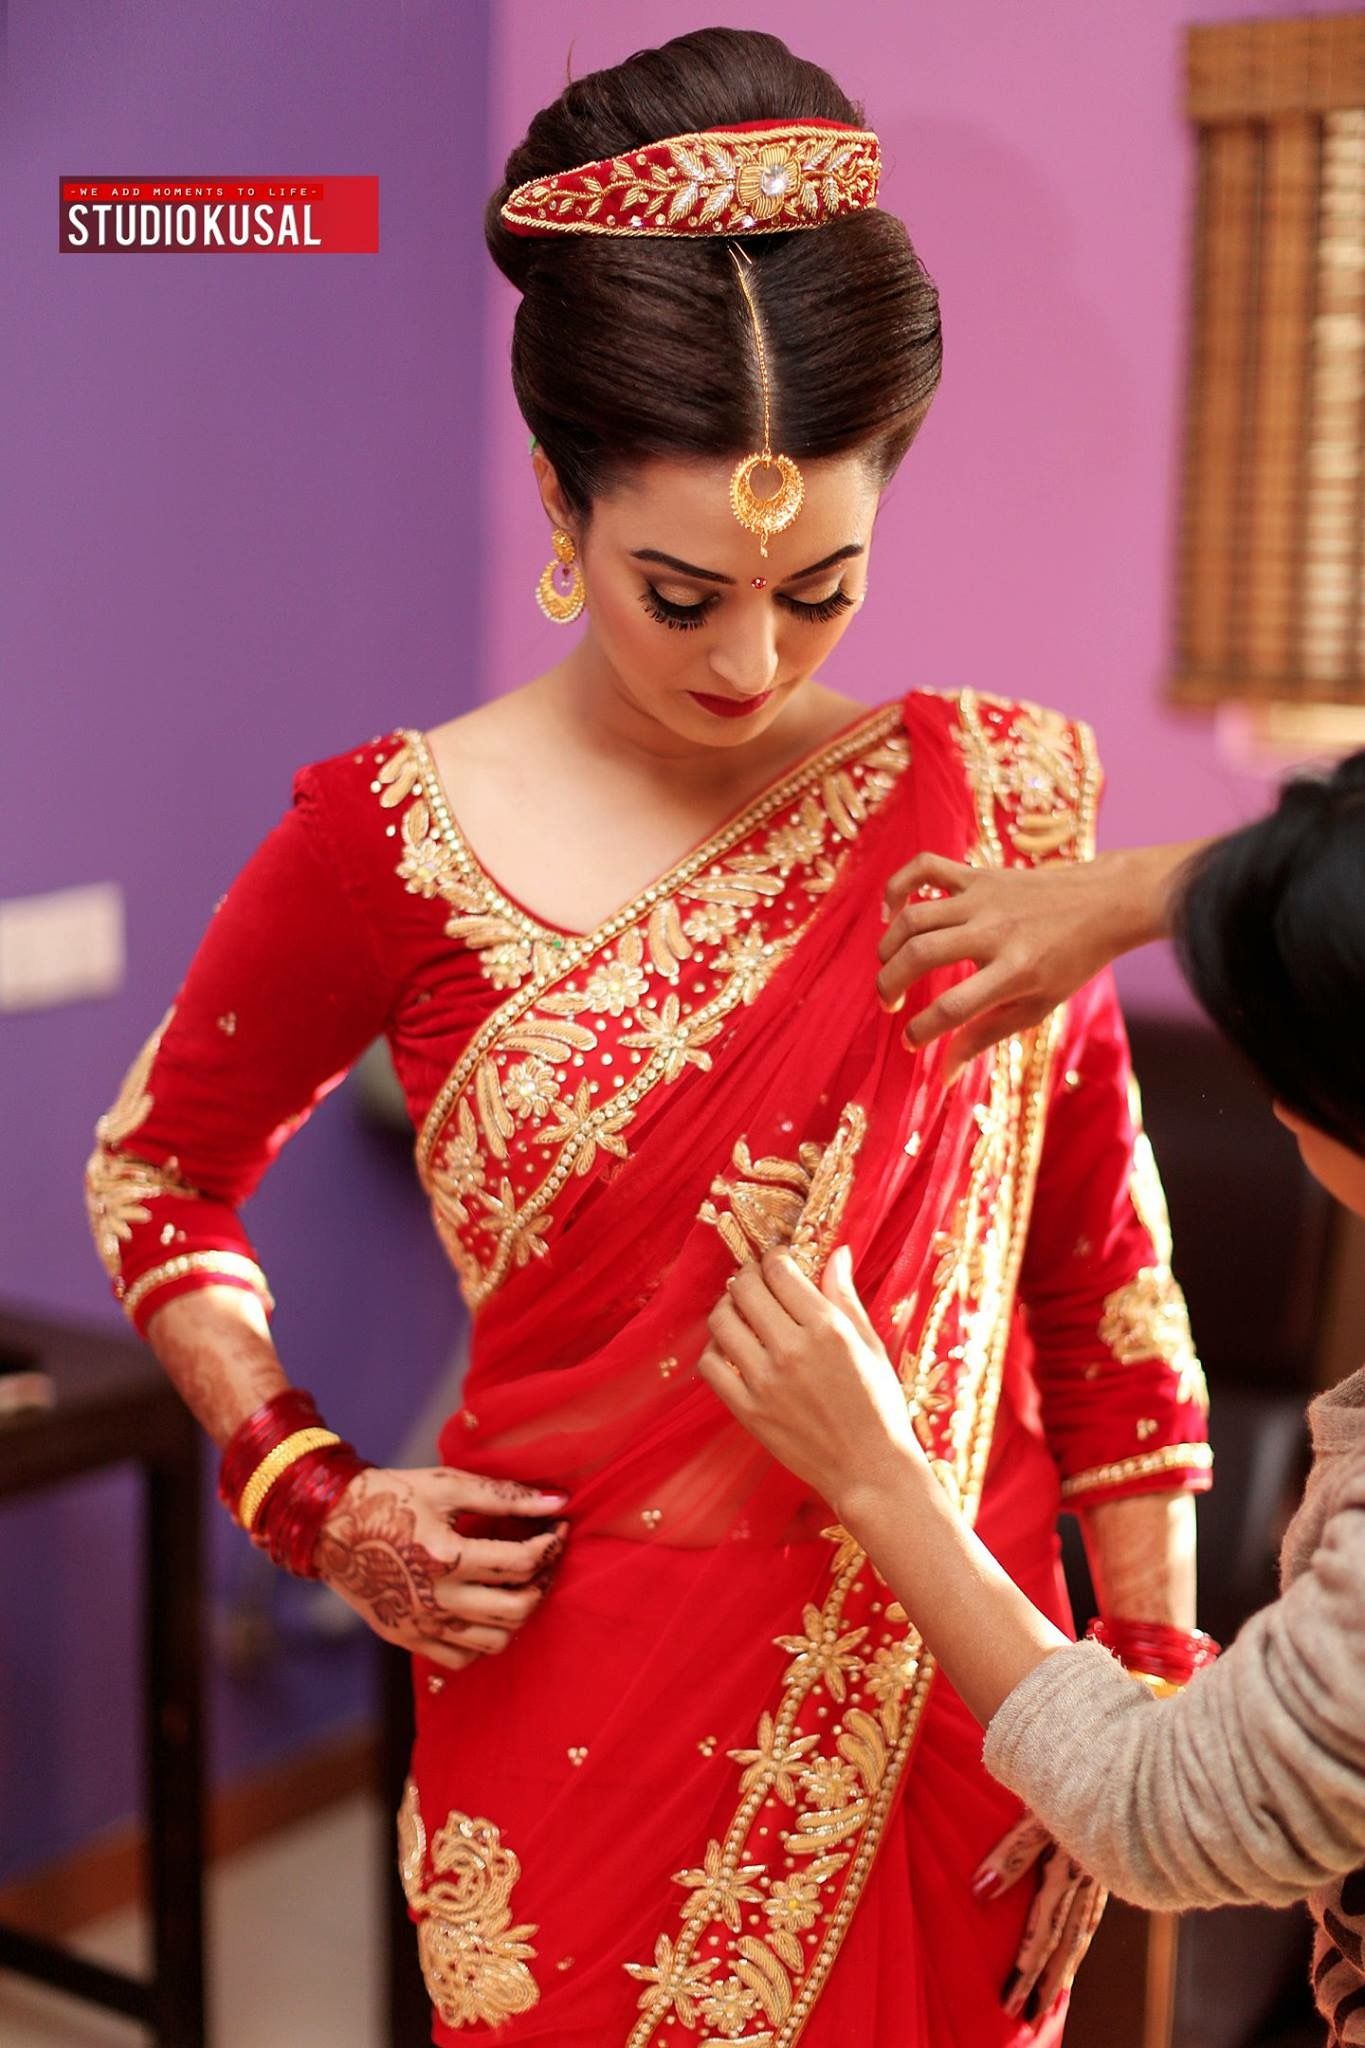 We Add Moments To Life Studiokusal Picturenepal Reception Day 2 Bride Pranita Hair Makeu Beautiful Wedding Dresses Bride Clothes Bengali Bridal Makeup